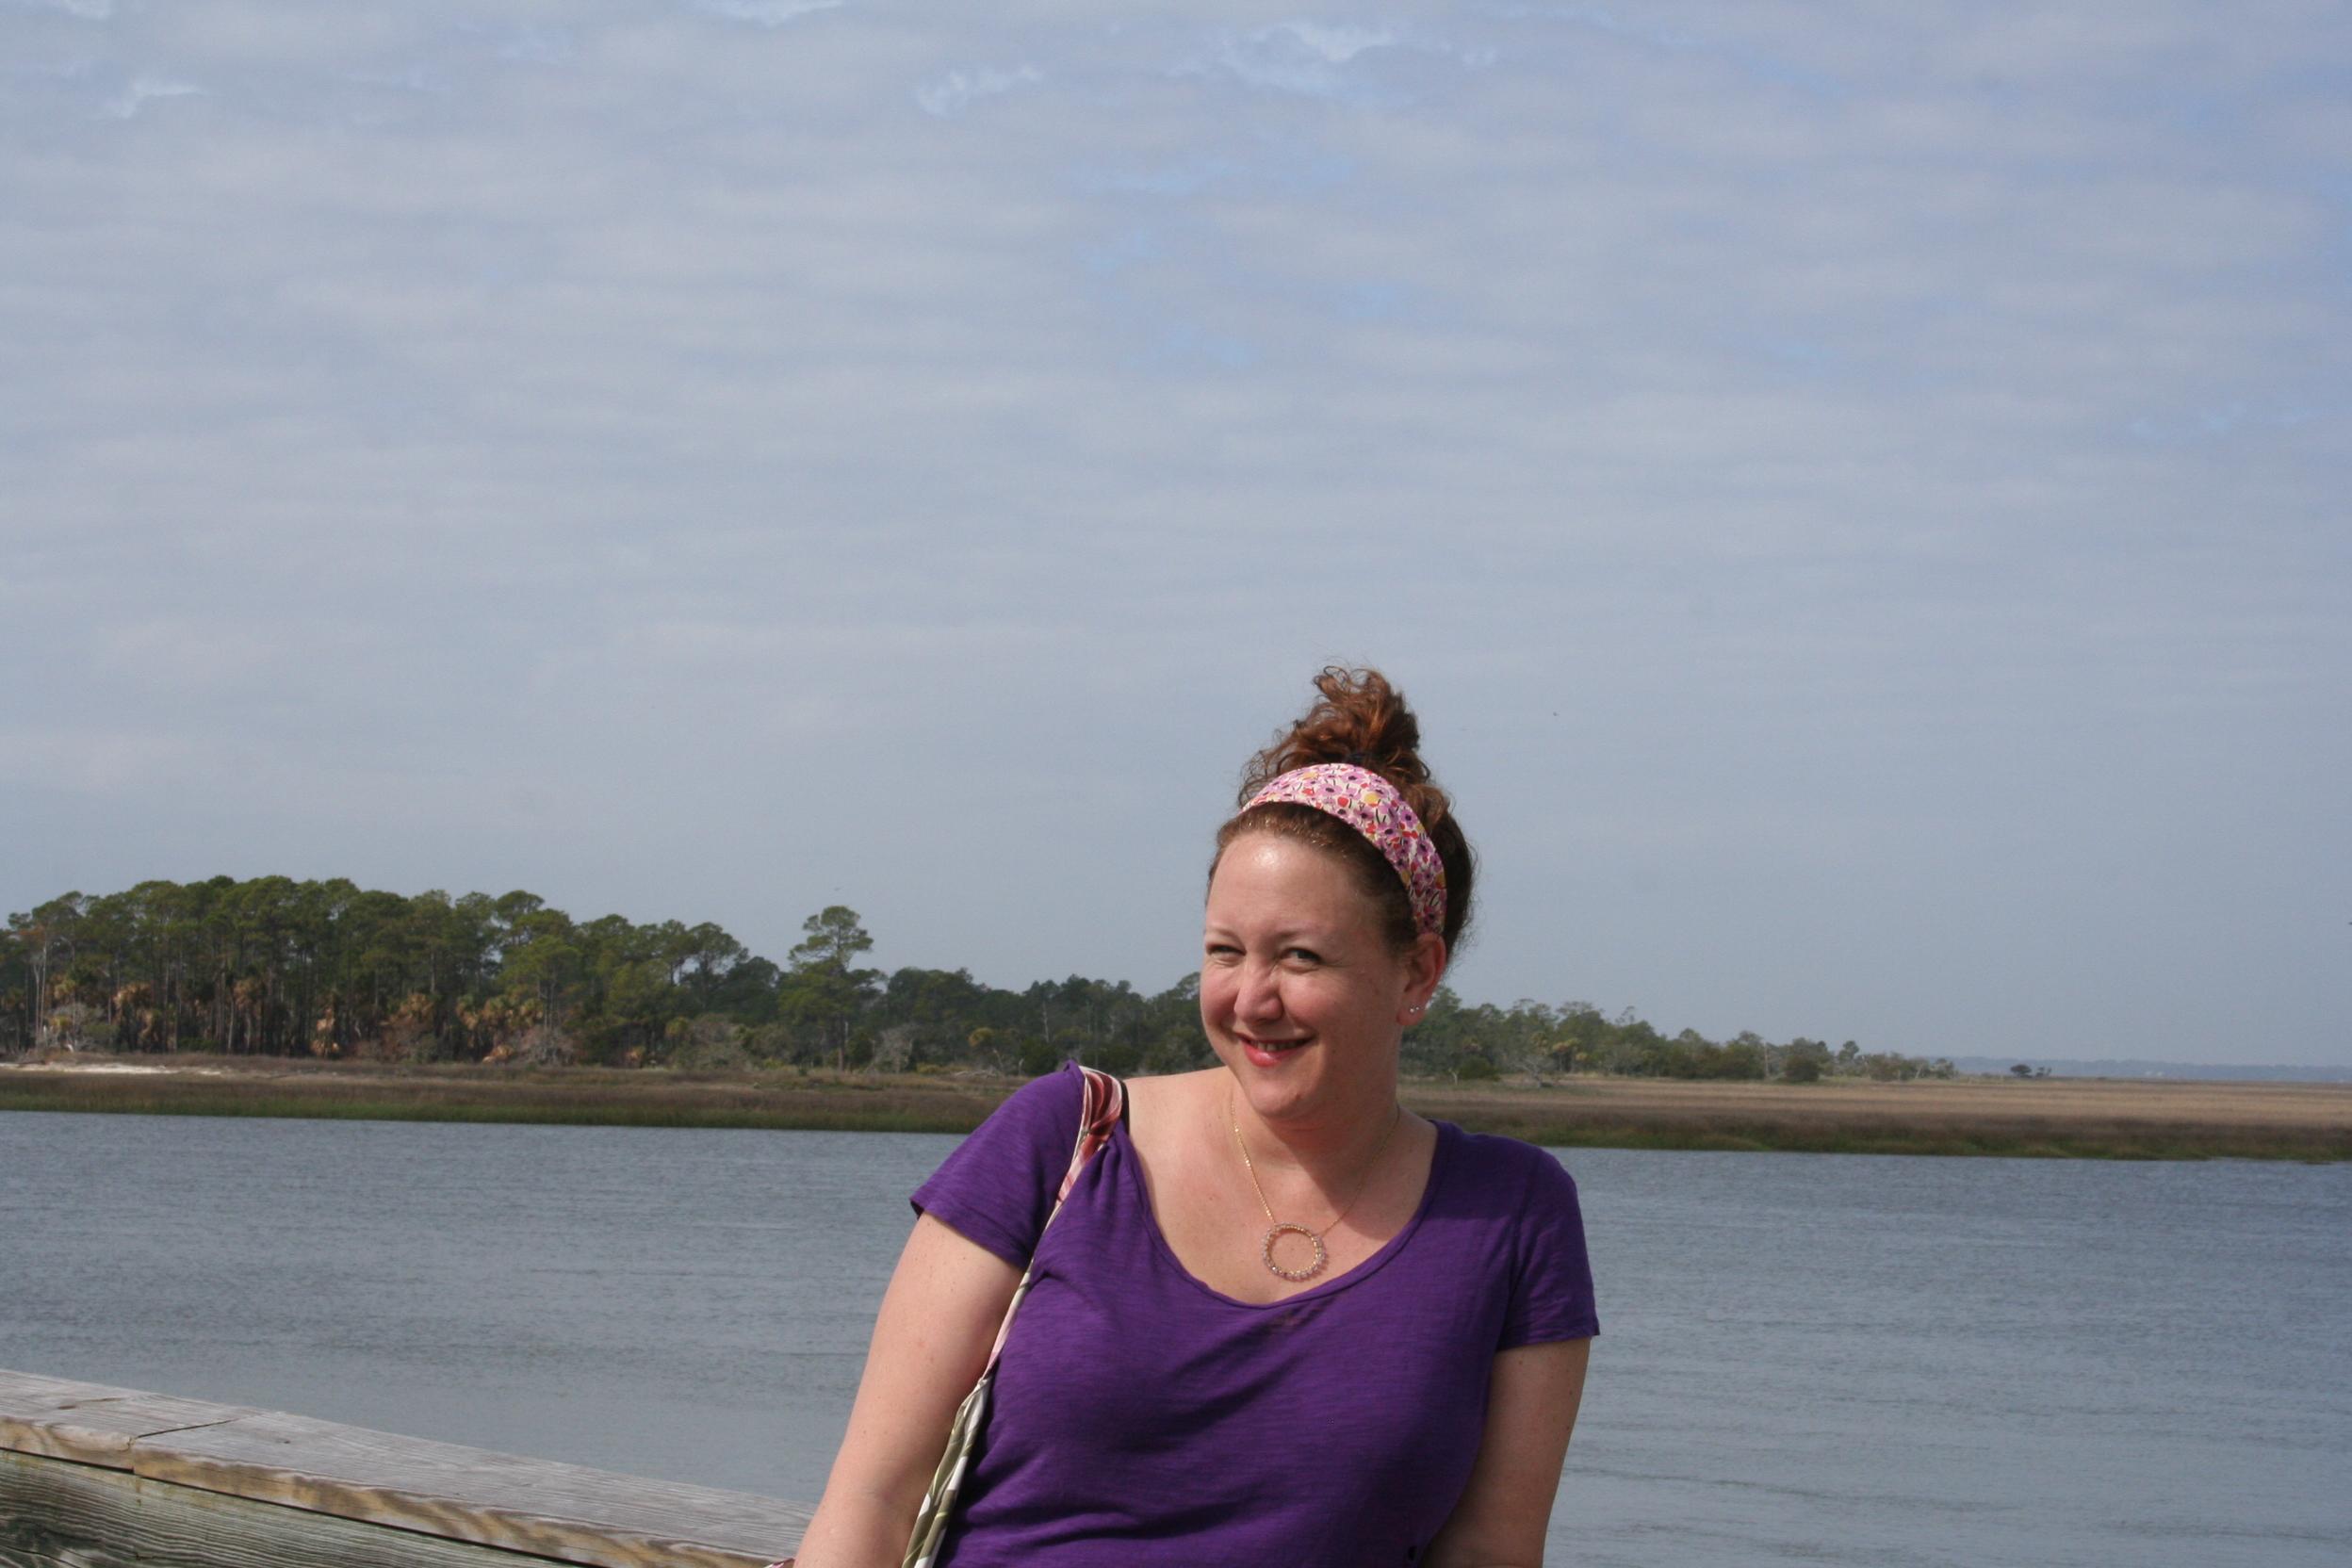 Don't I look happy to be having my photo made?